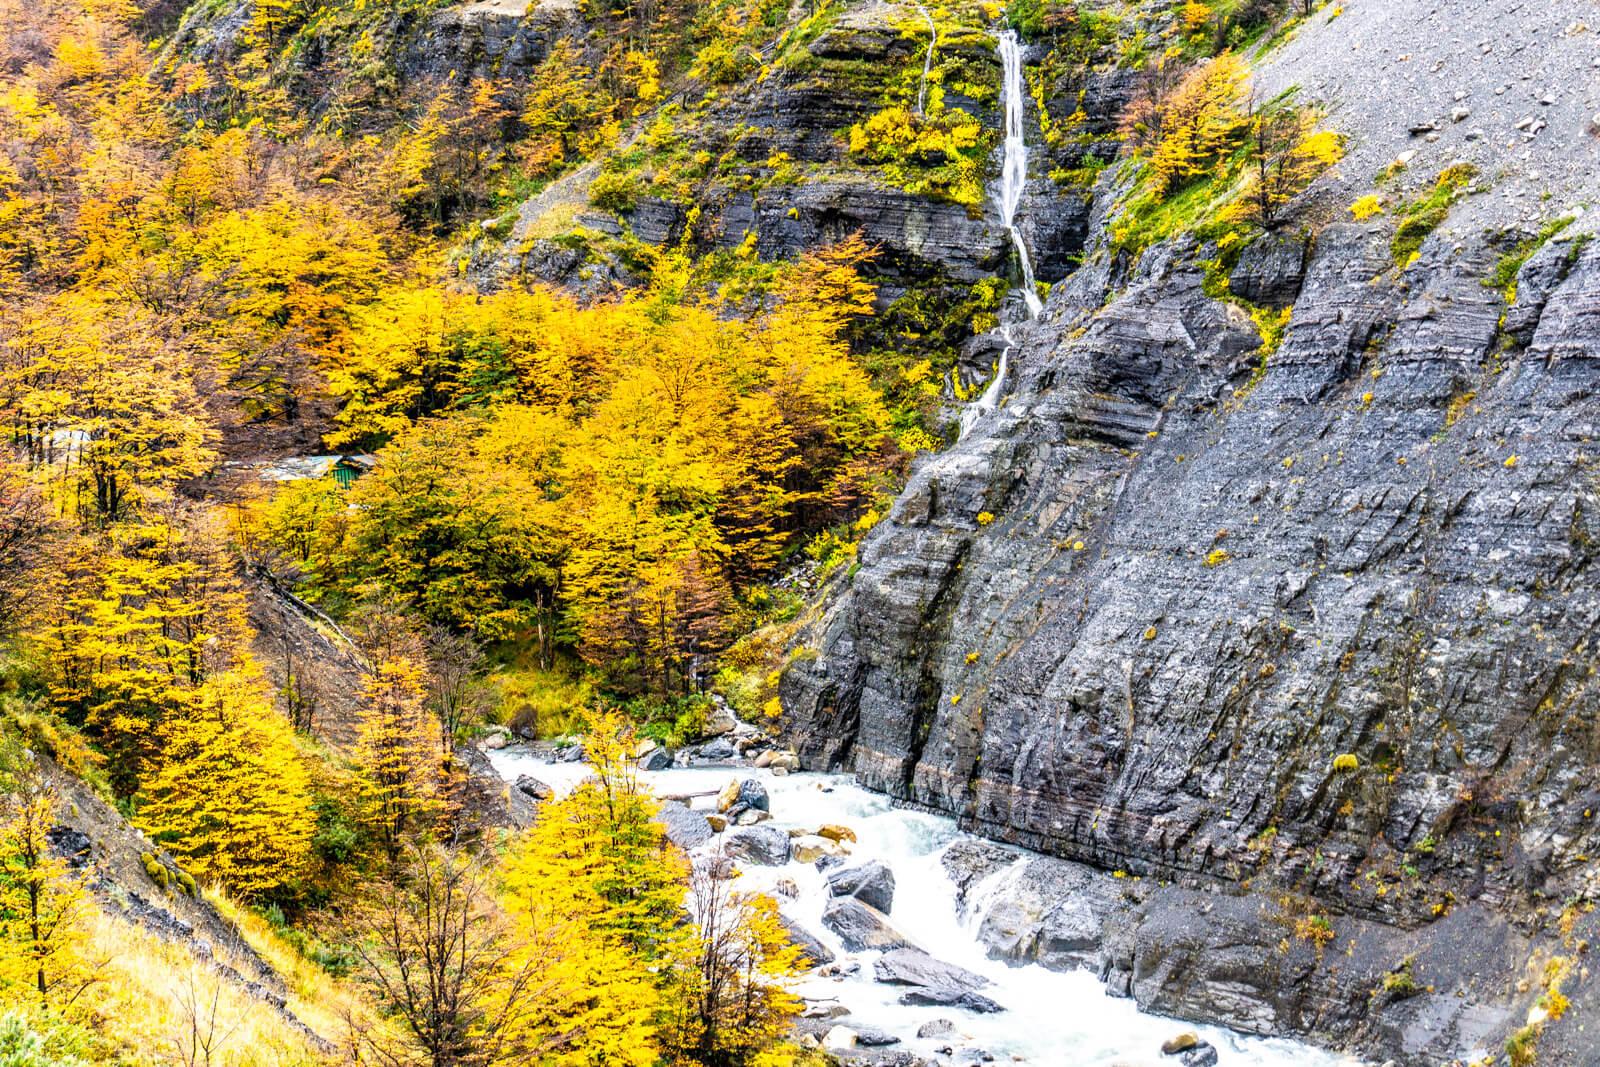 Torres del Paine W Trek during Autumn, an unforgettable experience